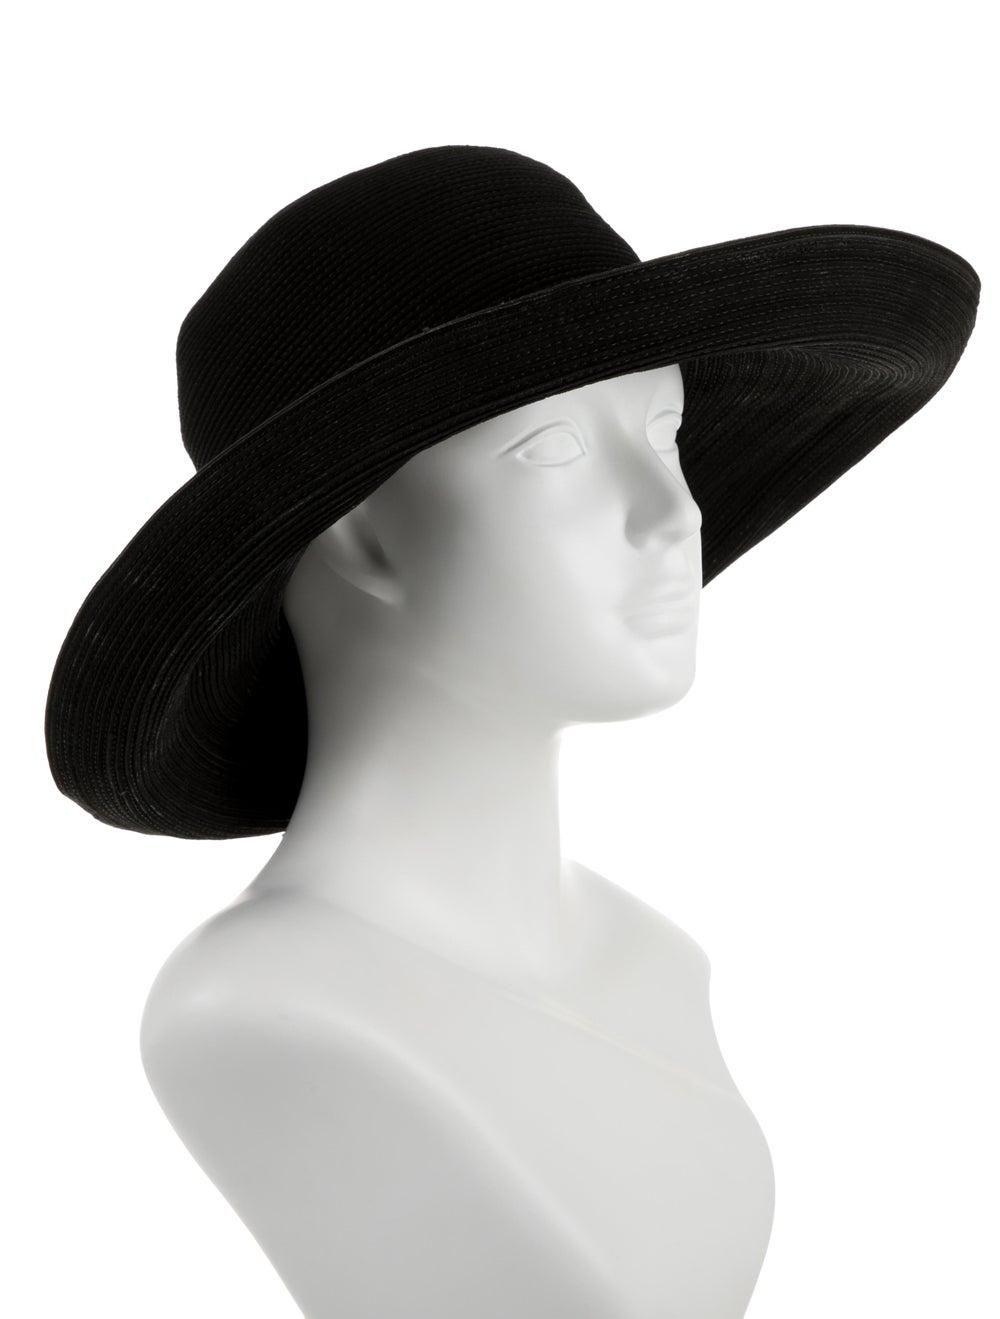 Patricia Underwood Straw Wide Brim Hat Black - image 3